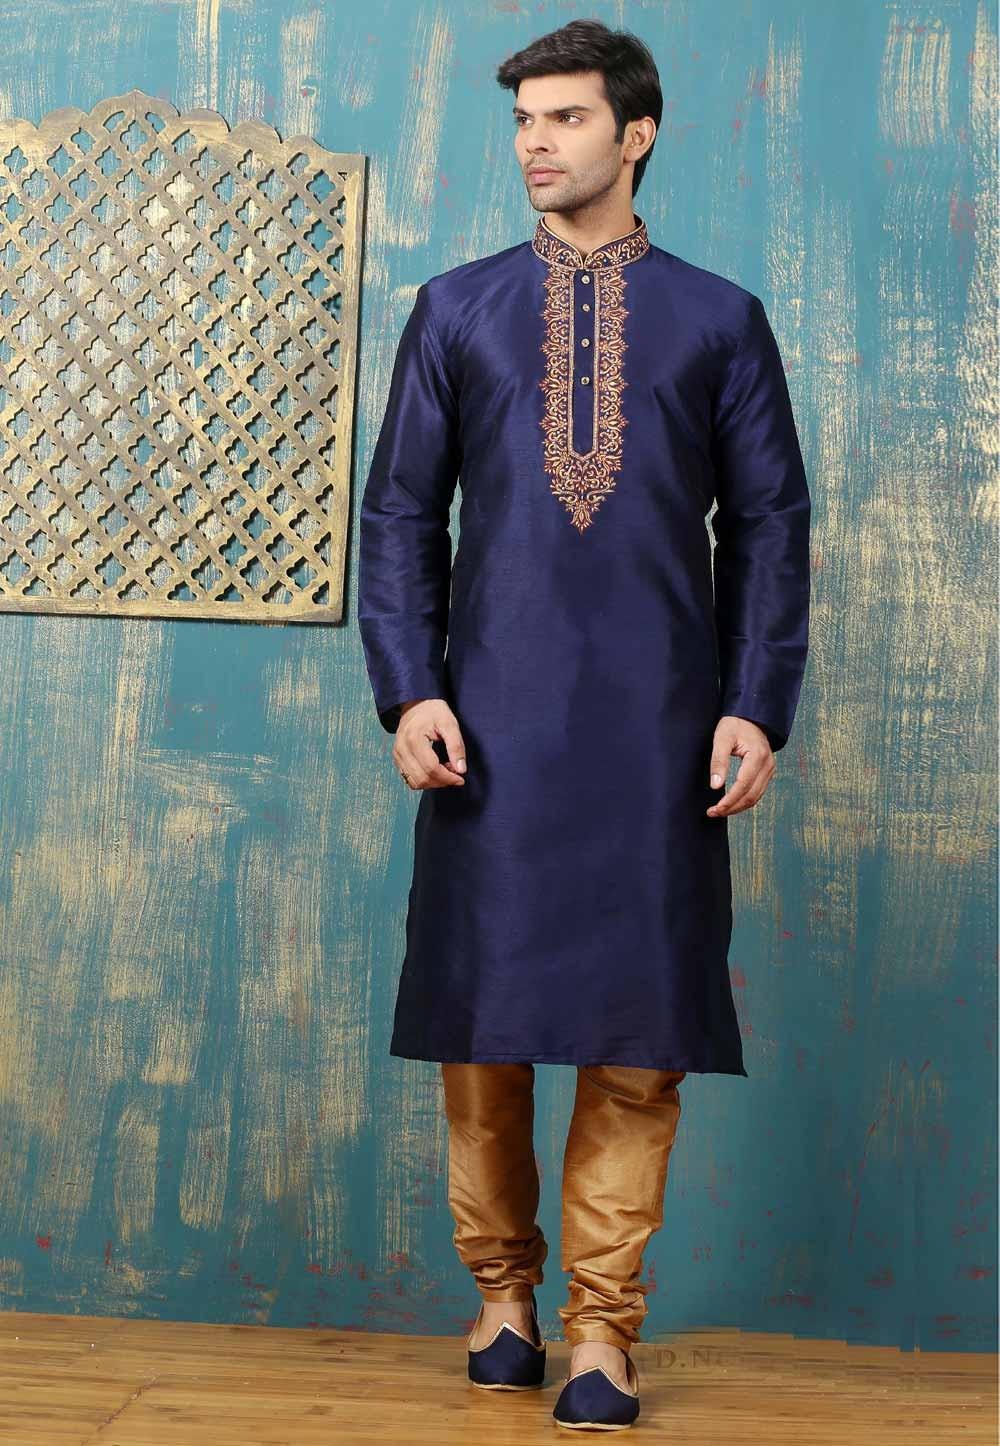 Exquisite Dupion Art Silk Navy Blue Color Men's Readymade Kurta Pajama.